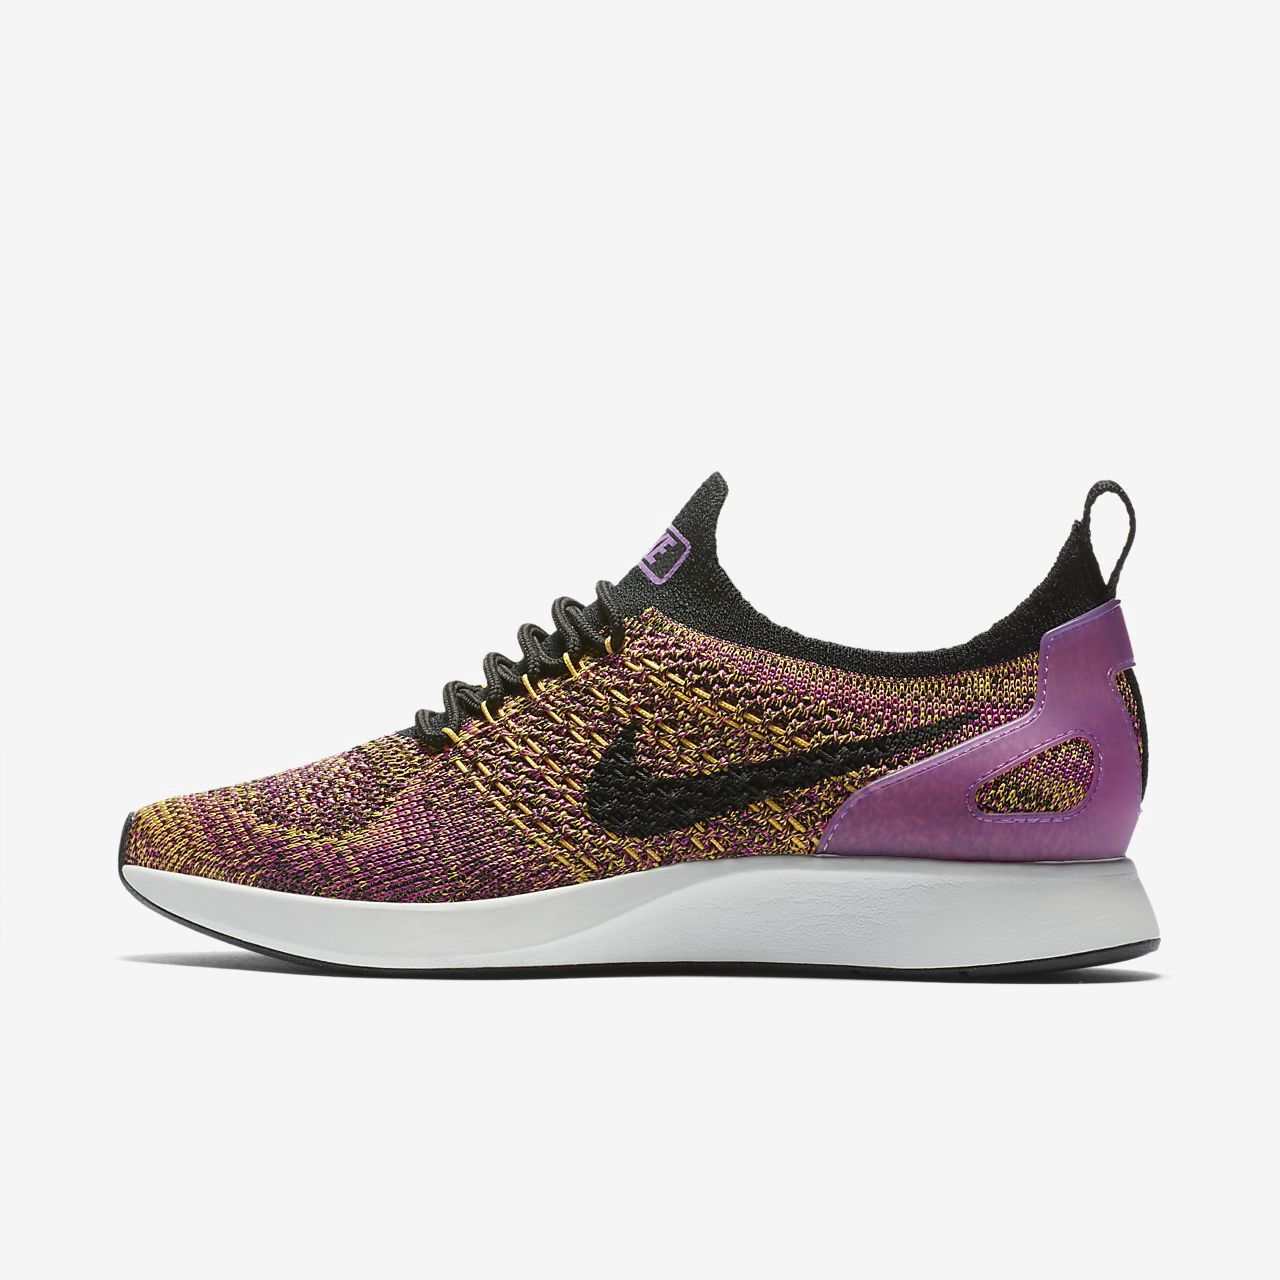 Nike Air Zoom Mariah Flyknit Racer Women's Shoe 10.5